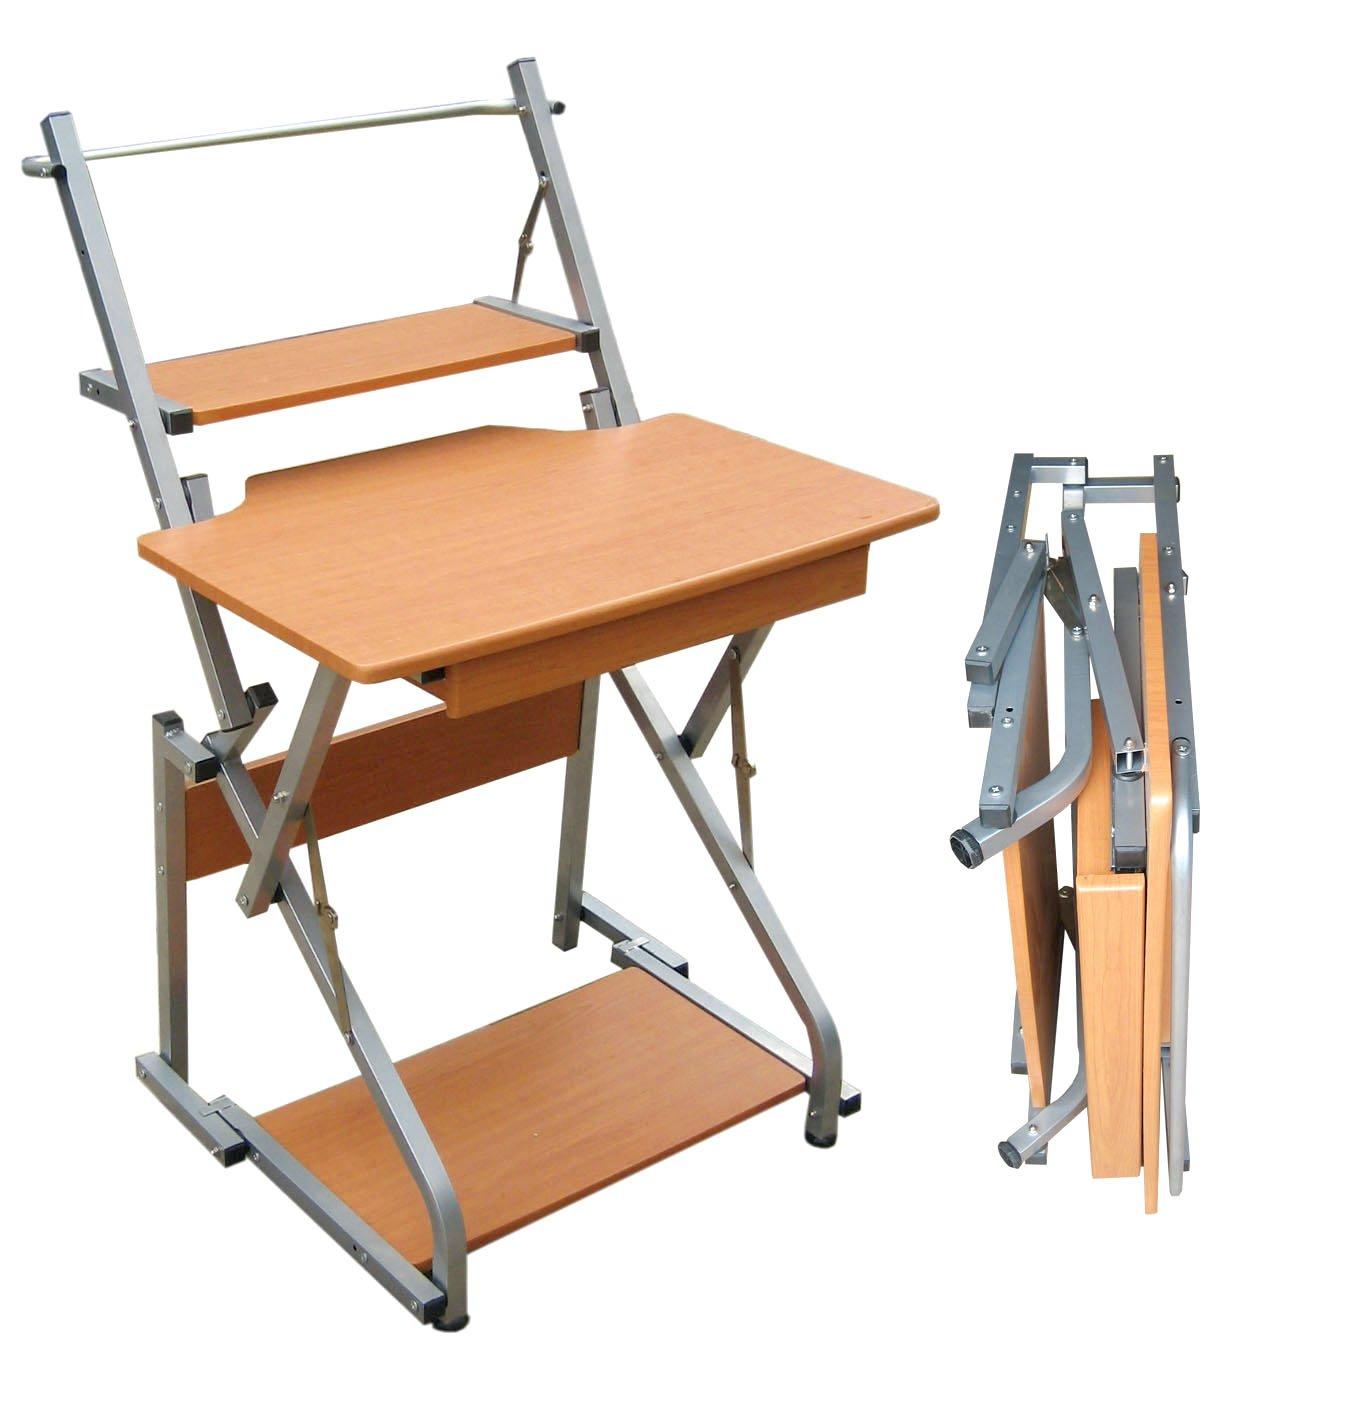 pliable bureau d 39 ordinateur table pliante id de produit. Black Bedroom Furniture Sets. Home Design Ideas